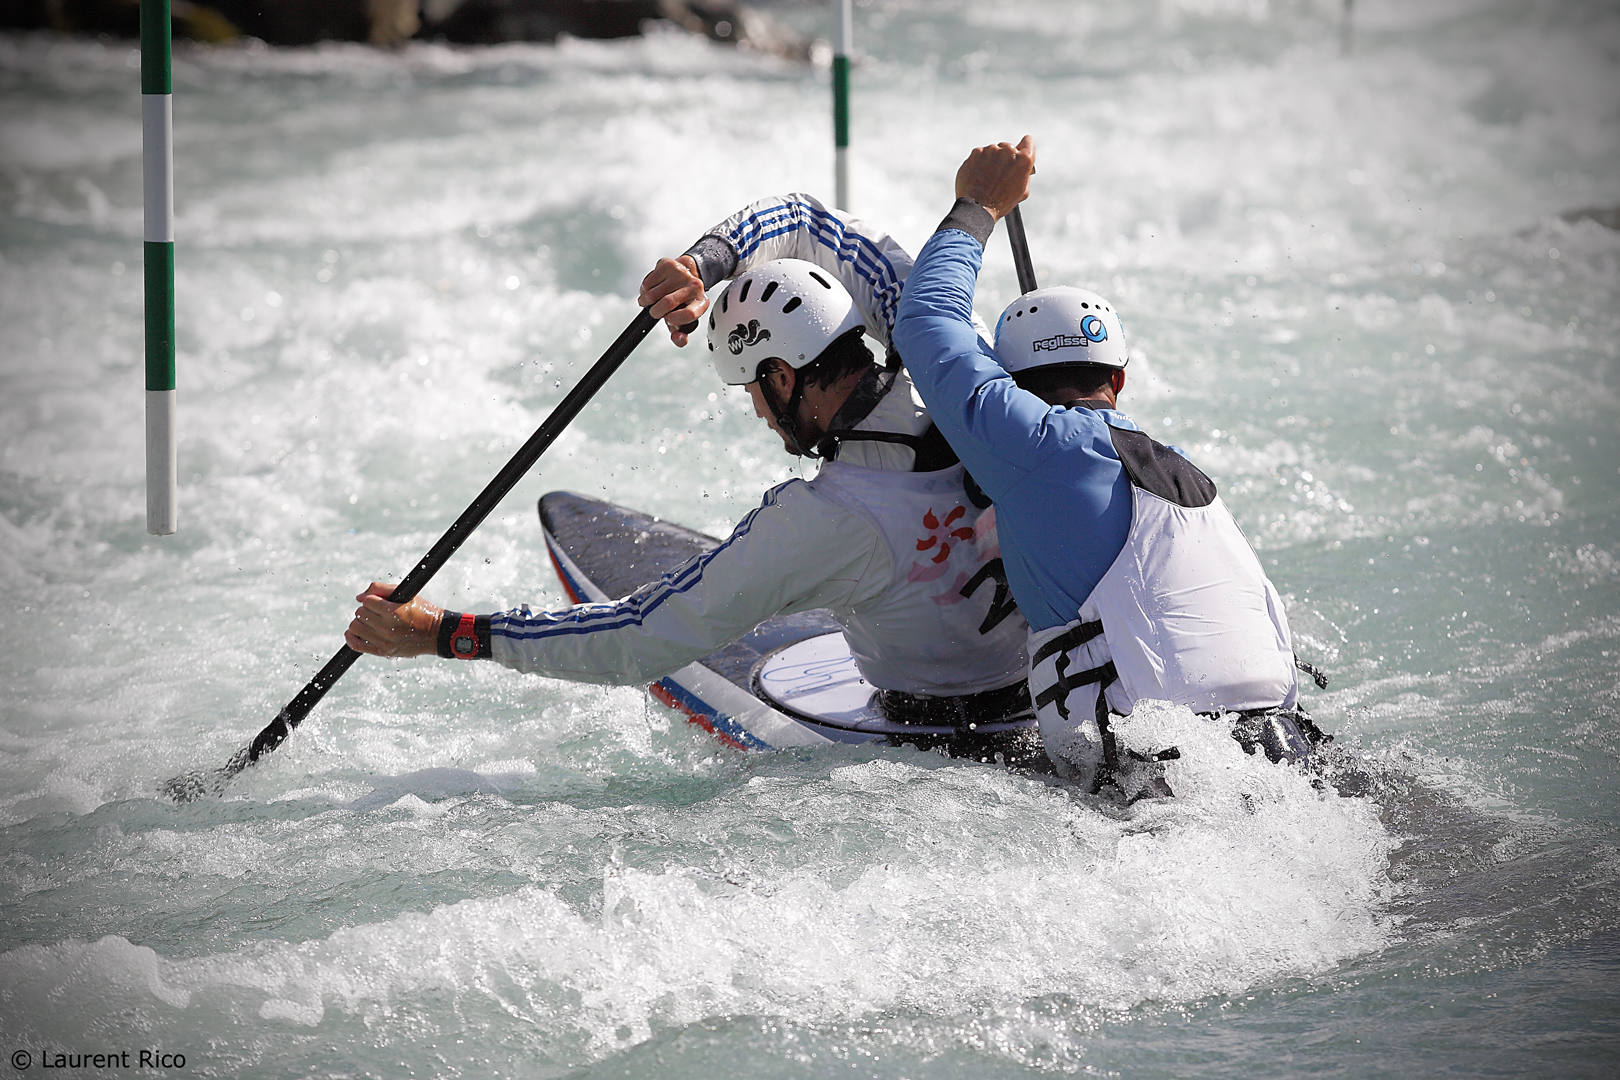 laurent-rico-savoie-bourg-saint-maurice-canoe-kayak-biplace-france-reportage-presse-photo-championnats-slalom-